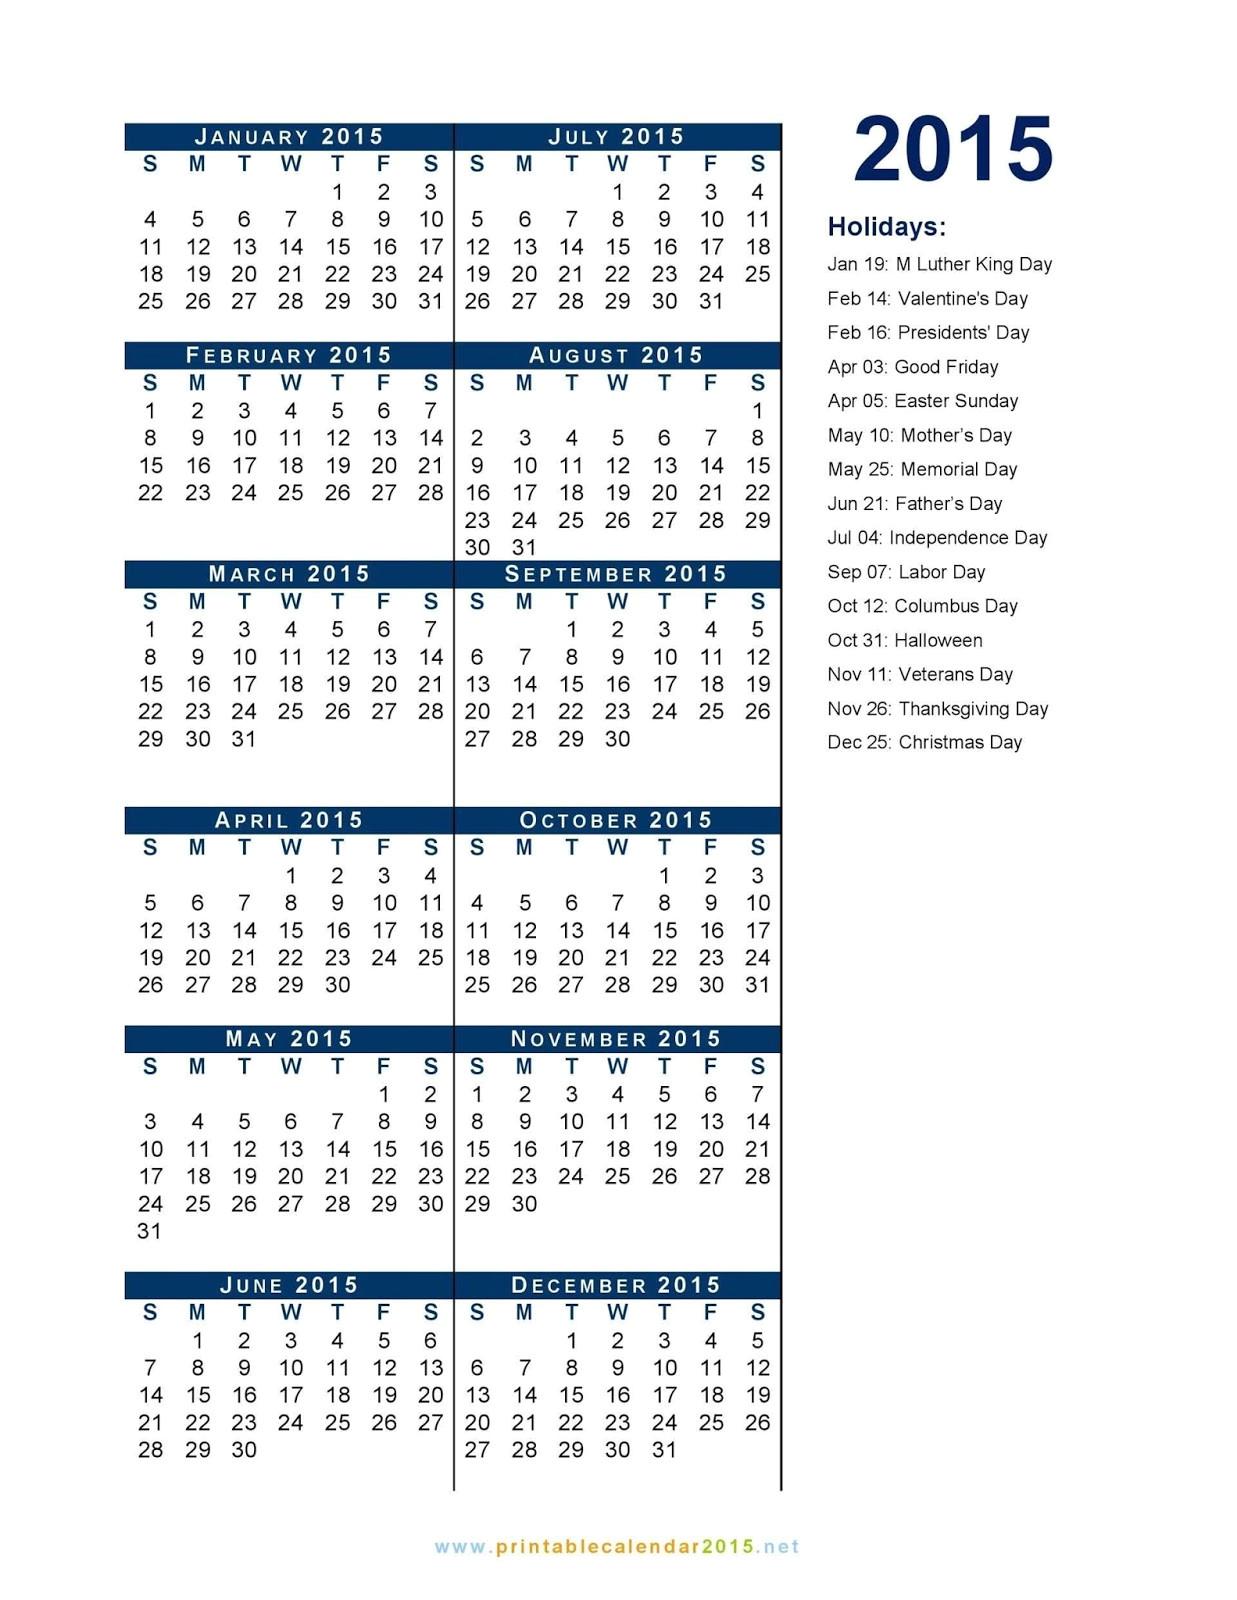 iupui holiday list 2015